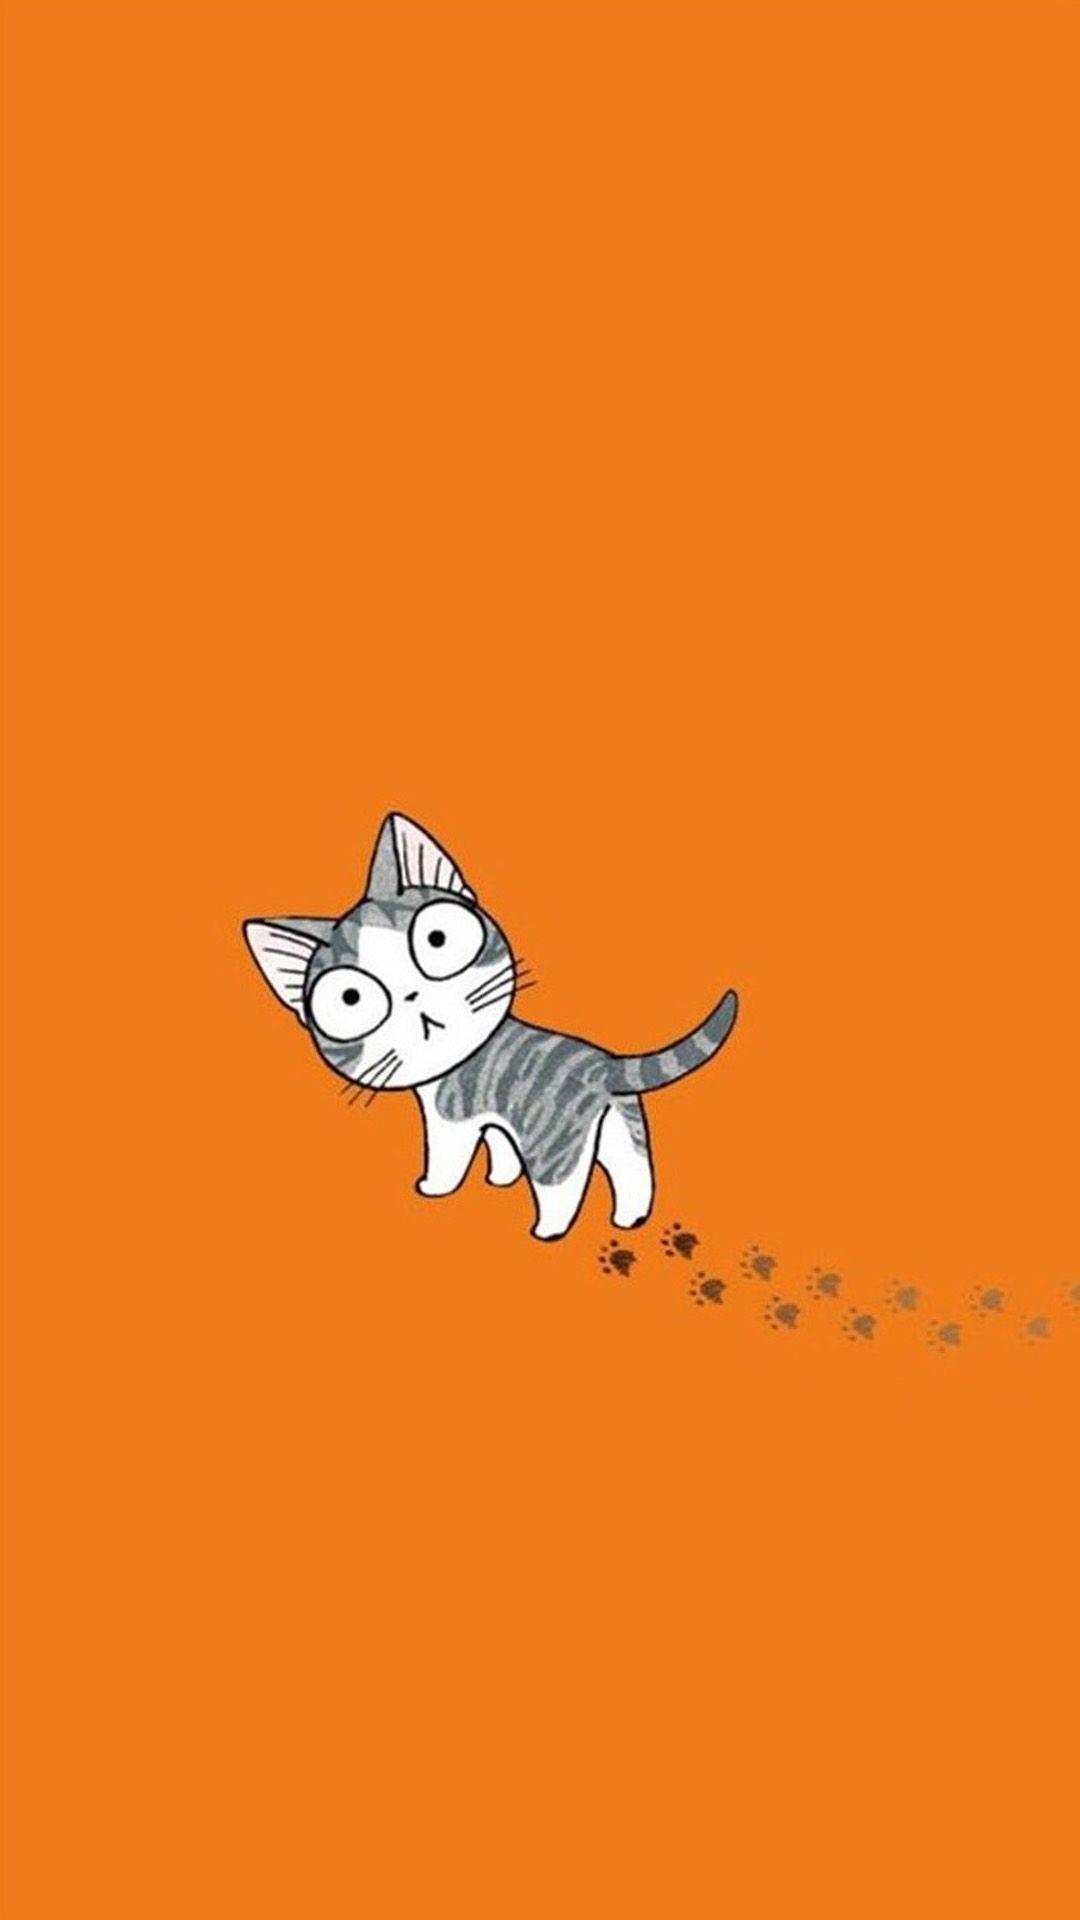 Cartoon Cat Wallpapers Top Free Cartoon Cat Backgrounds Wallpaperaccess Animal Wallpaper Cartoon Wallpaper Hd Cat Wallpaper